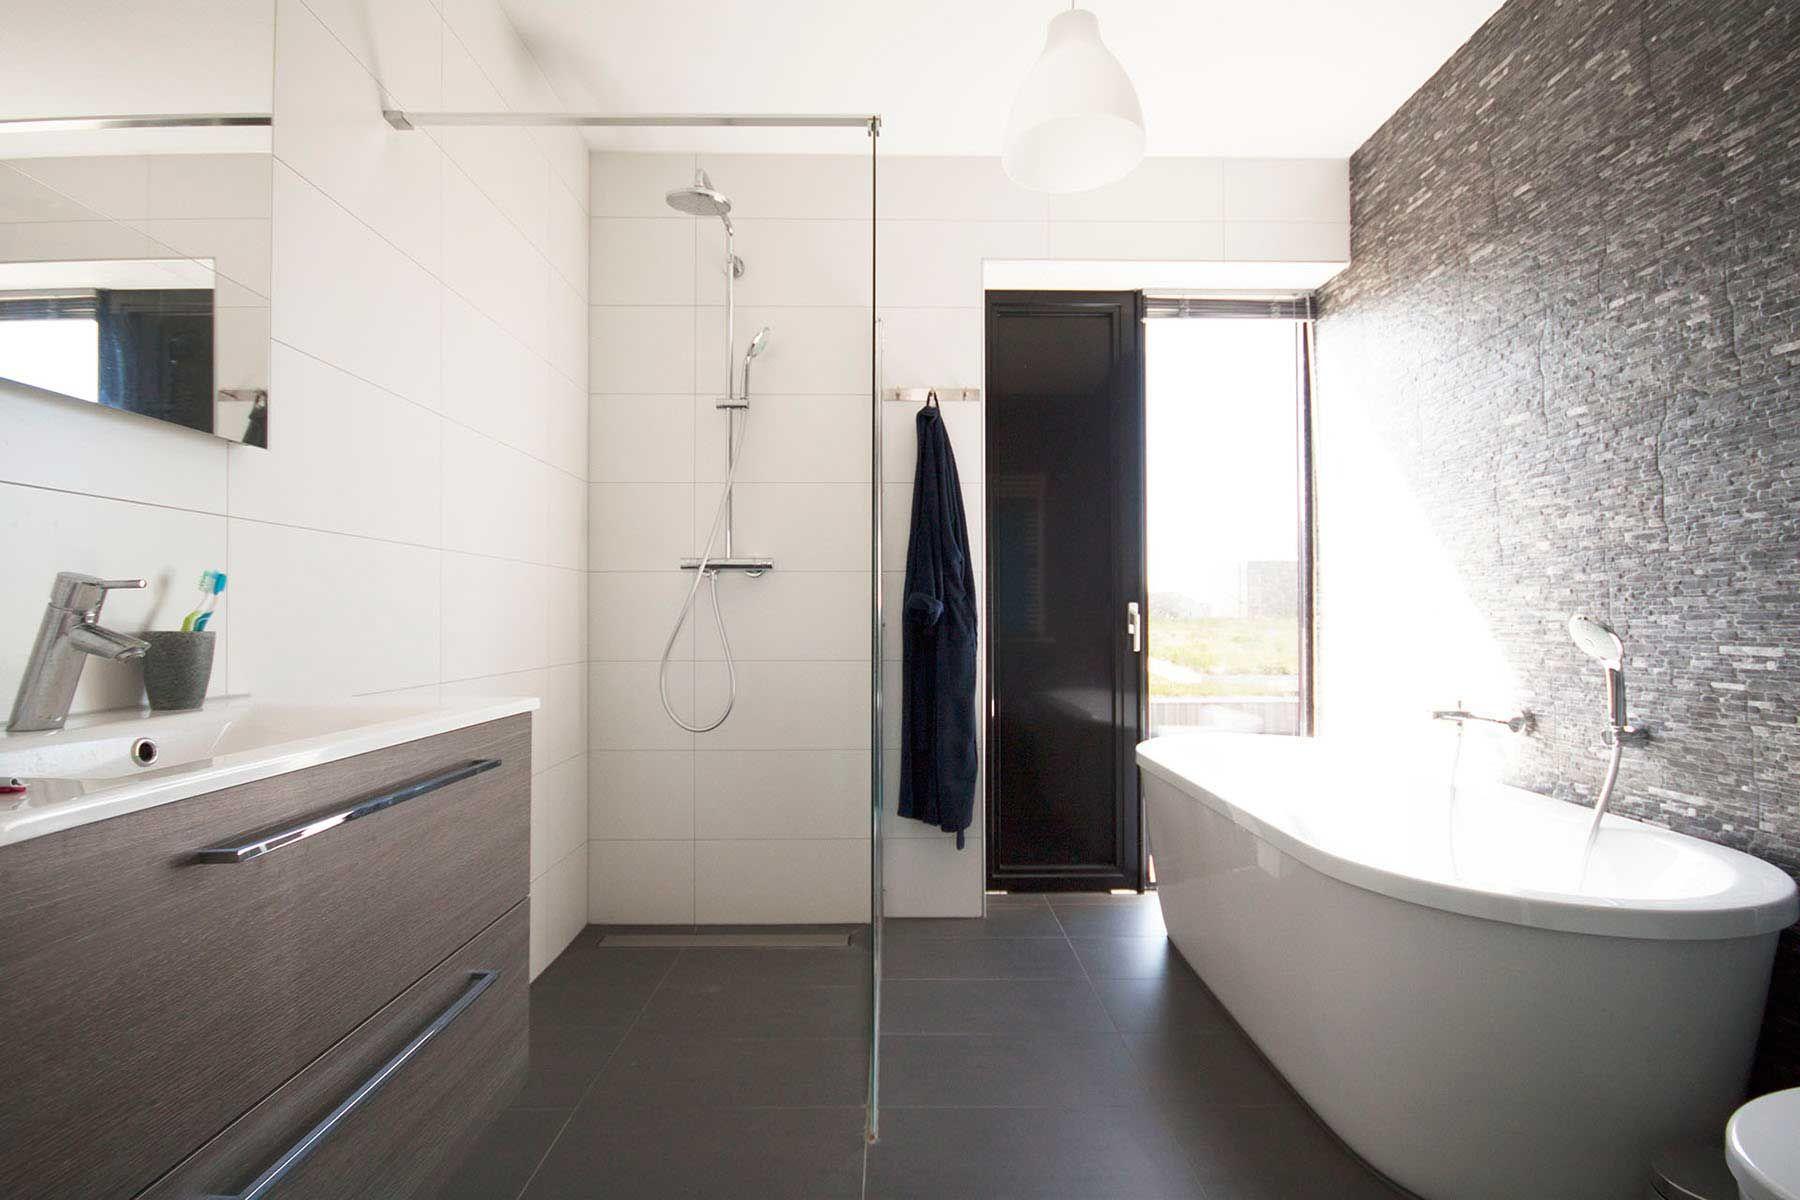 8A Architecten | Datcha house 4, Plant je Vlag, Nijmegen (Lent) - modern vrijstaand woonhuis